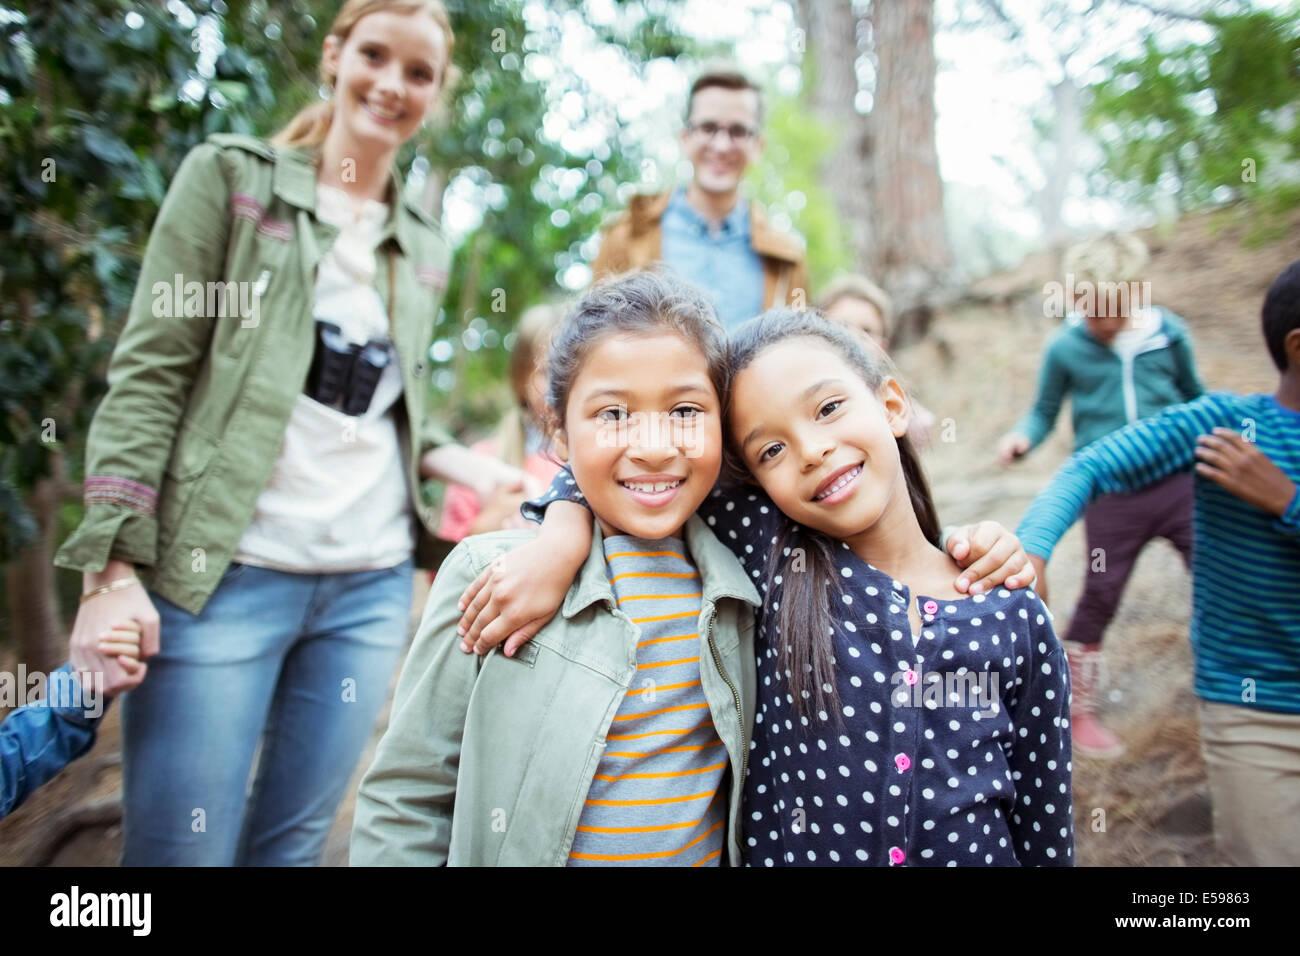 Étudiants et enseignants smiling in forest Photo Stock